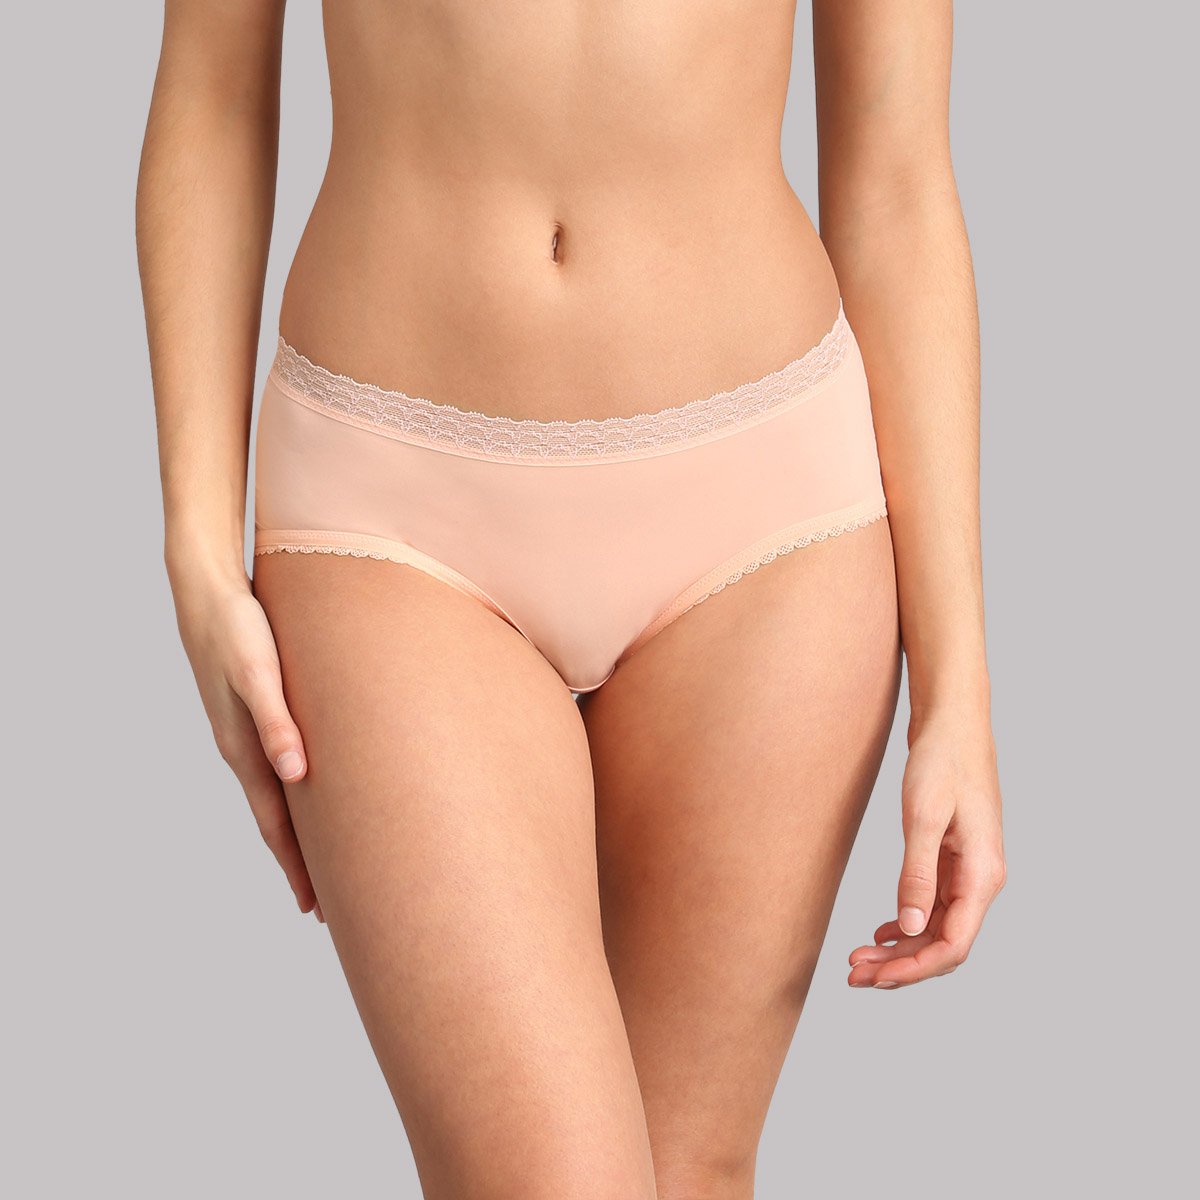 Midi knickers in sea salt pink - Invisible Elegance, , PLAYTEX